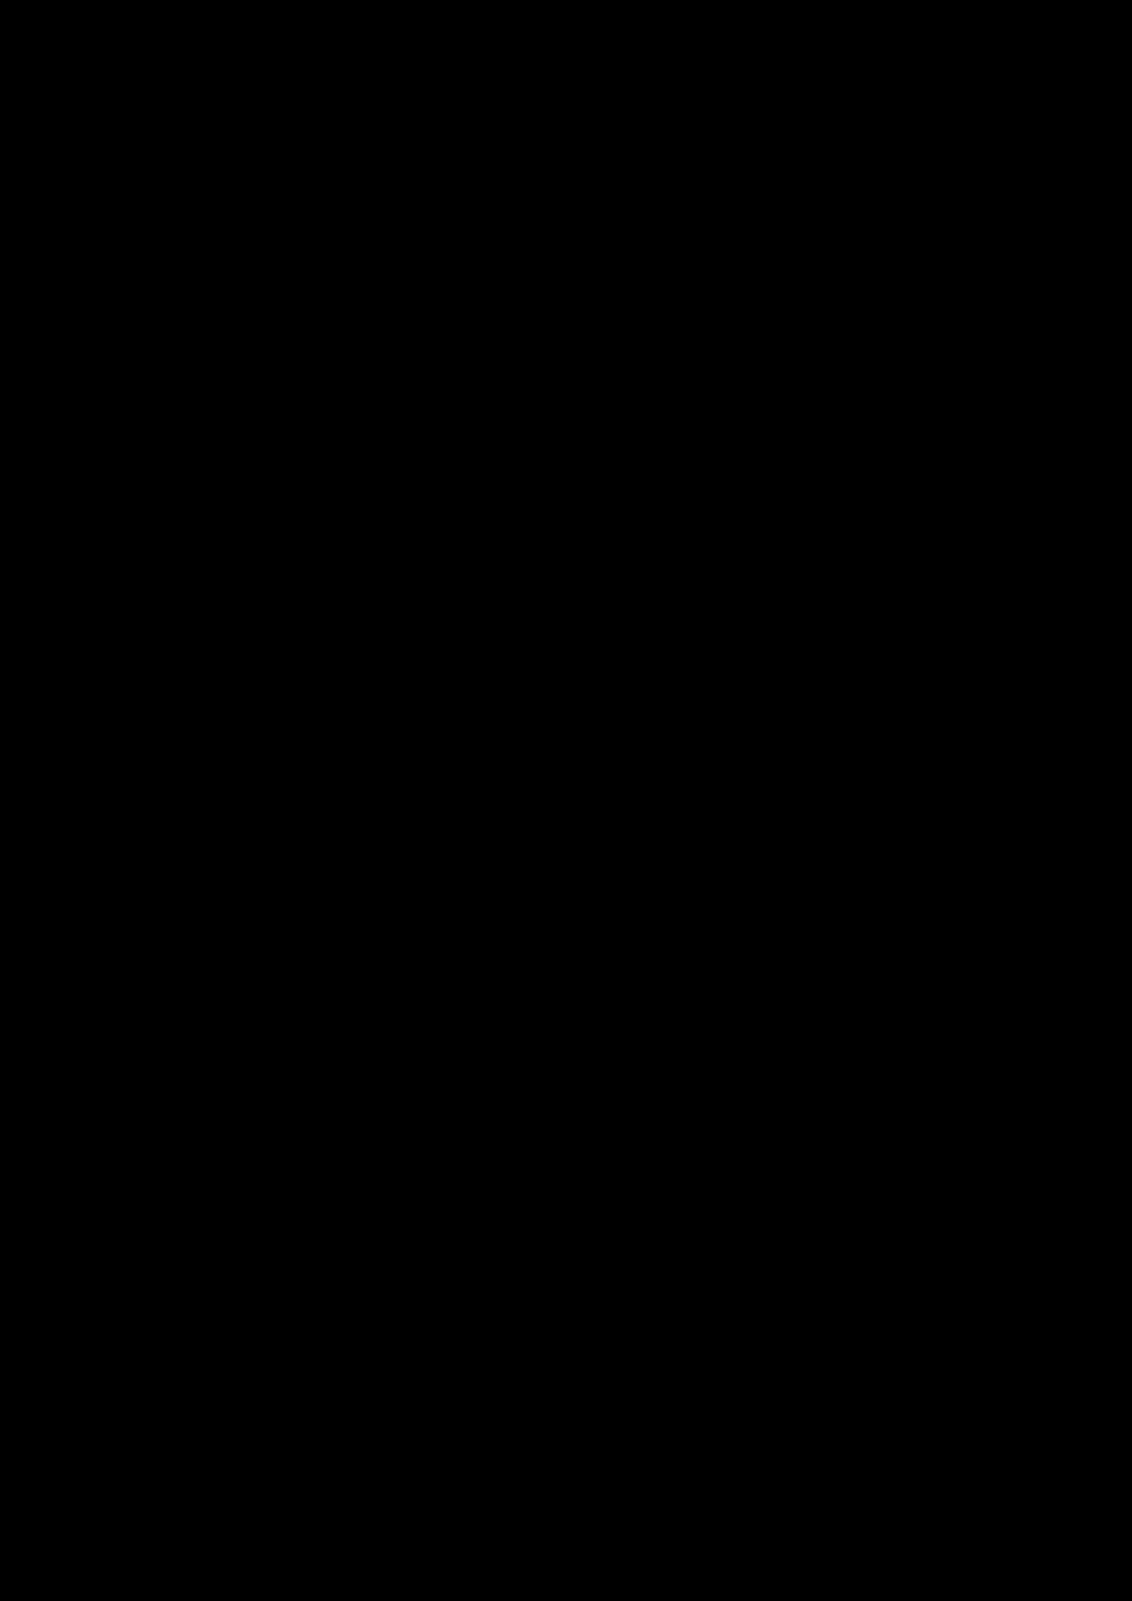 Korolevstvo slez slide, Image 2